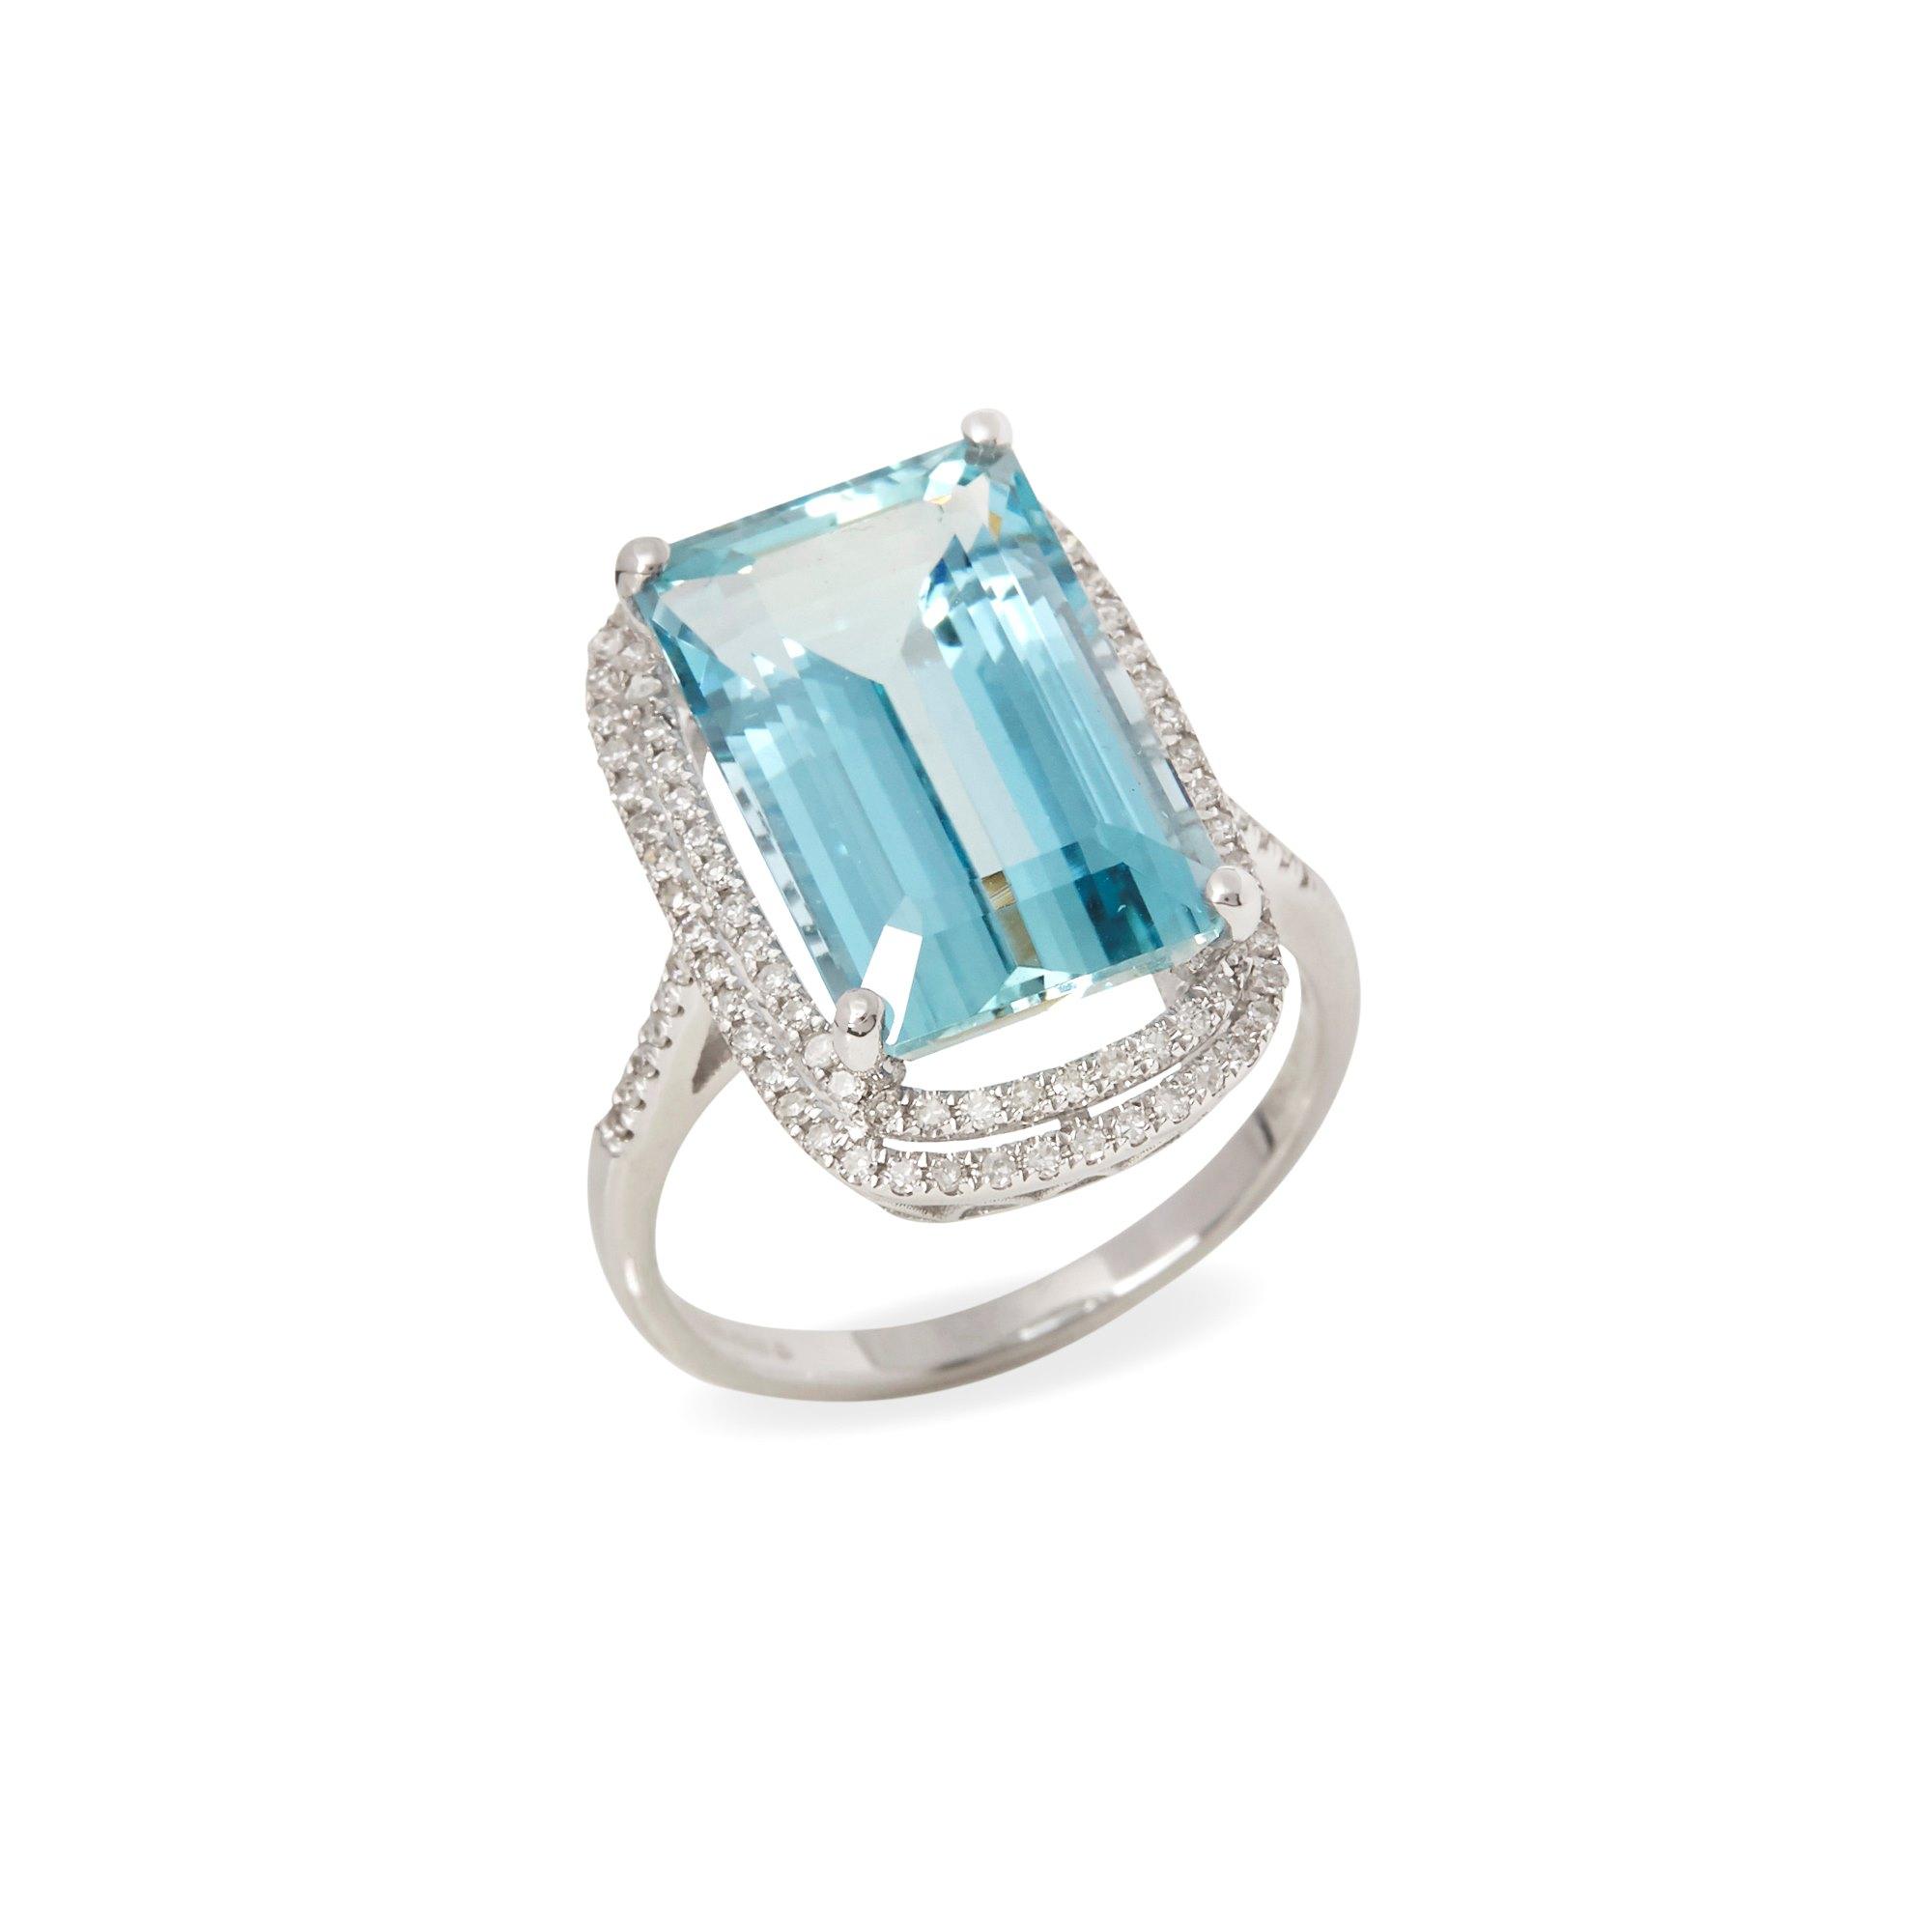 David Jerome Certified 8.71ct Brazilian Aquamarine and Diamond 18ct gold Ring